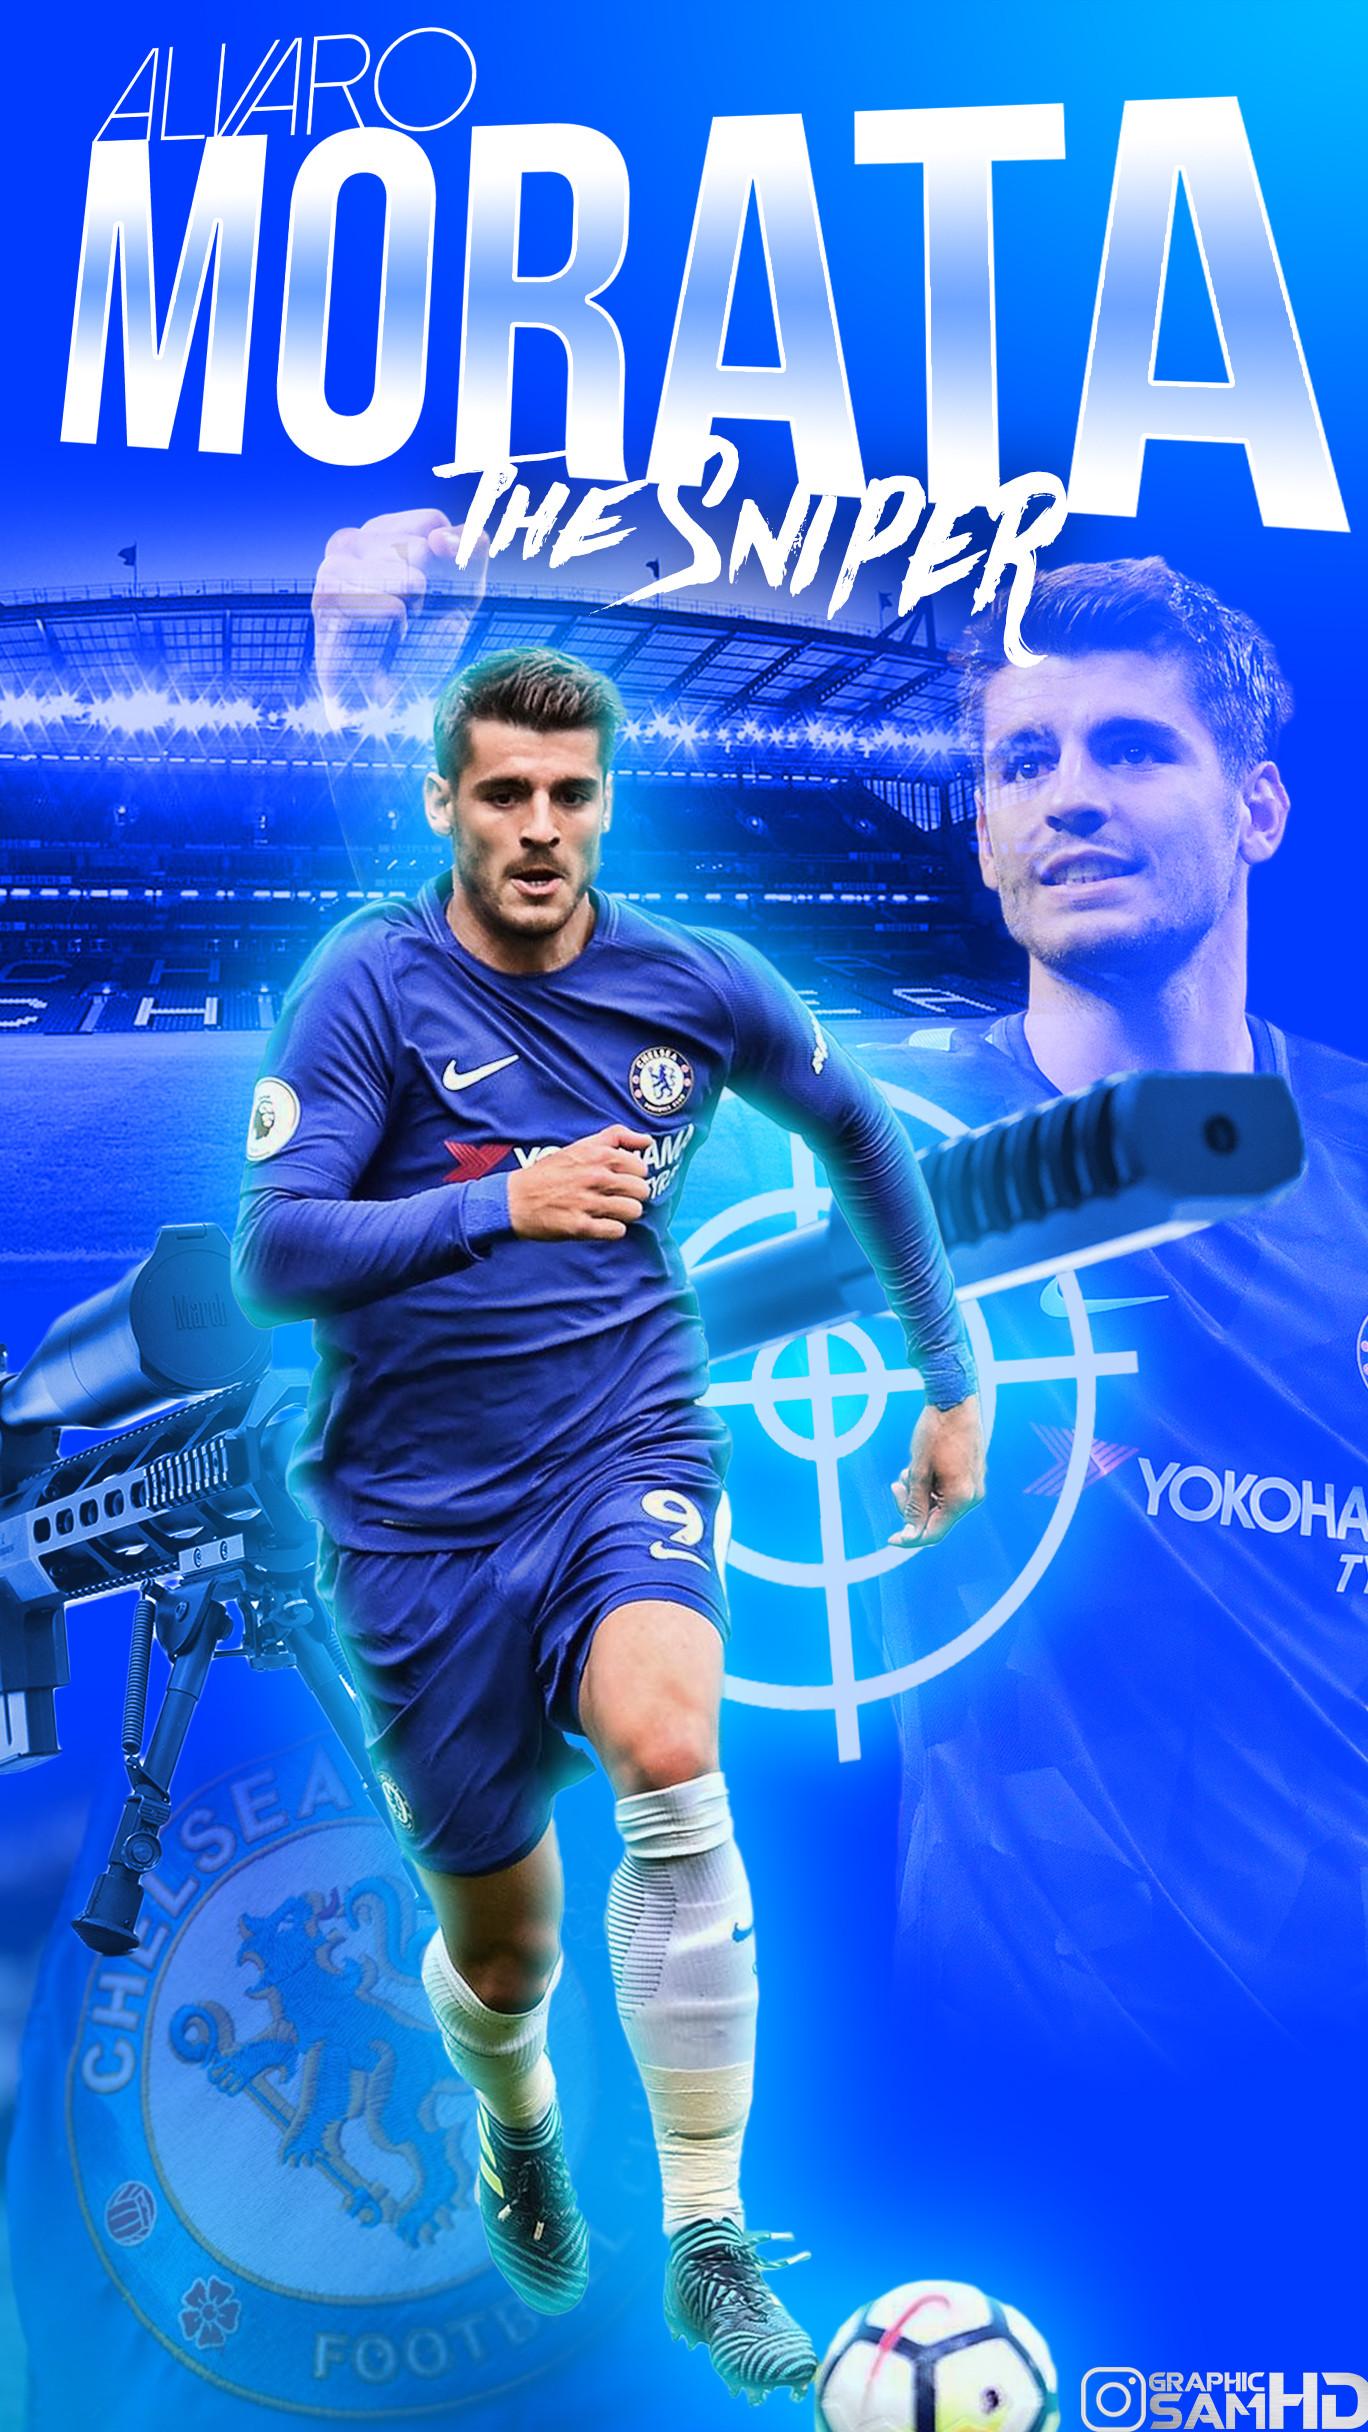 Chelsea wallpaper 2018 hd 67 pictures - Chelsea wallpaper 2018 hd ...